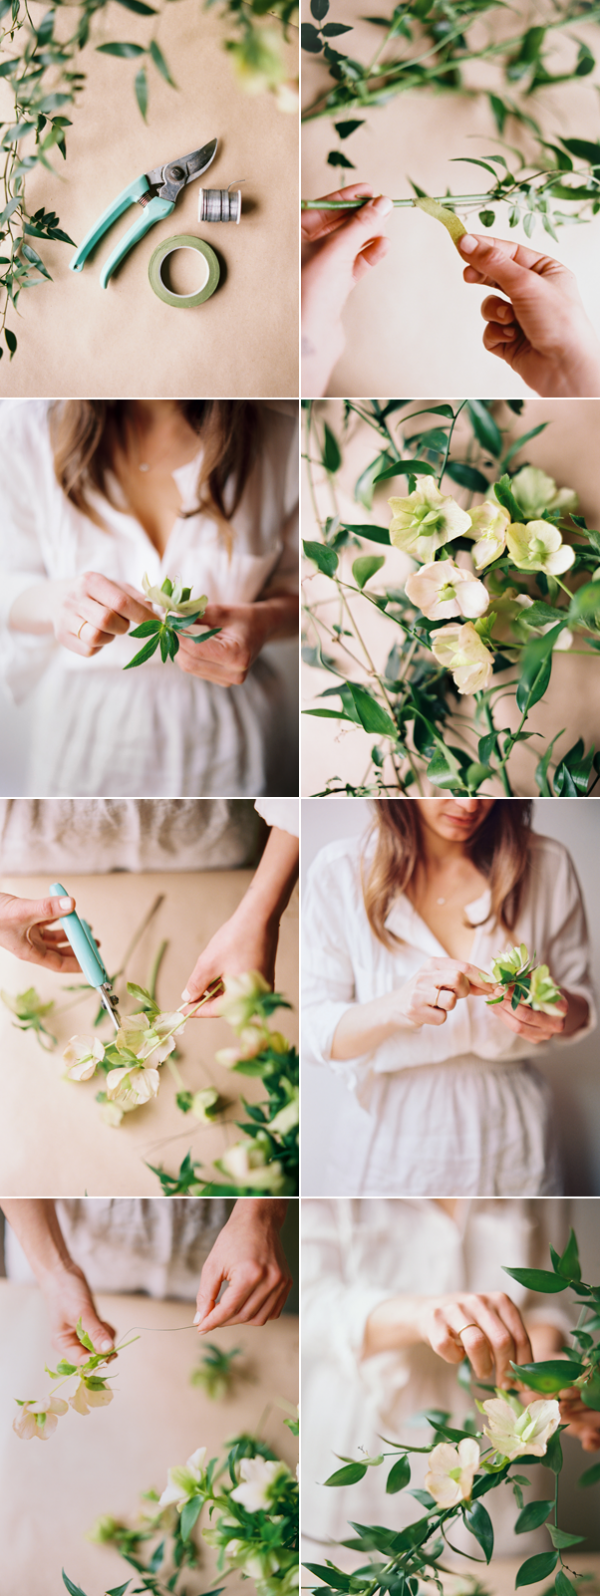 DIY Spring Wedding Garland Diy wedding garland, Garland